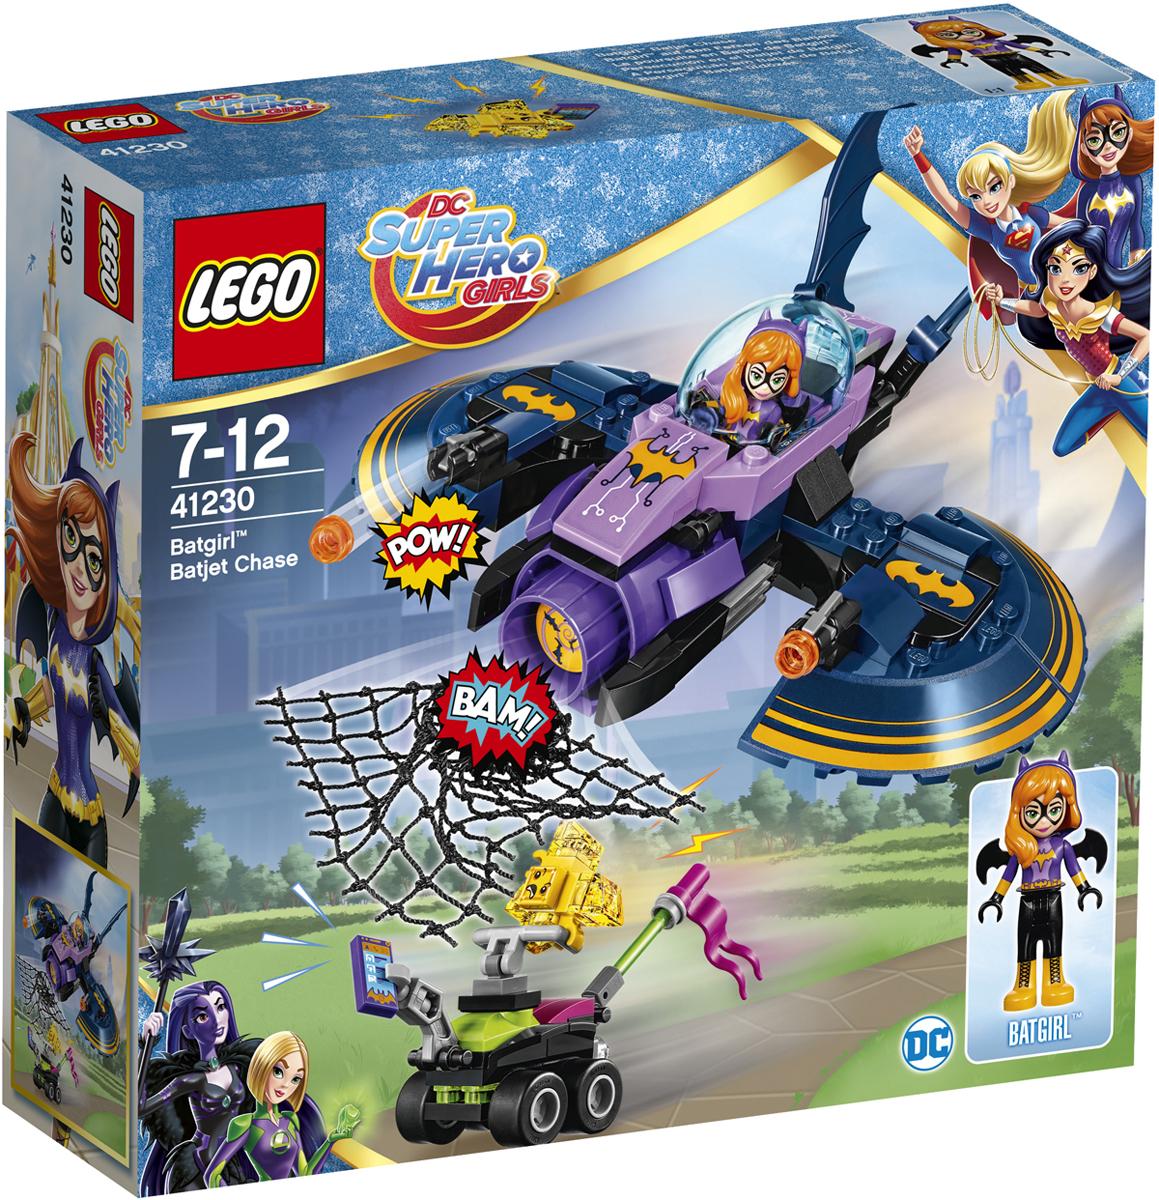 LEGO DC Super Hero Girls 41230 Бэтгерл погоня на реактивном самолете Конструктор lego super heroes 41230 лего супер хироус бэтгёрл погоня на реактивном самолёте